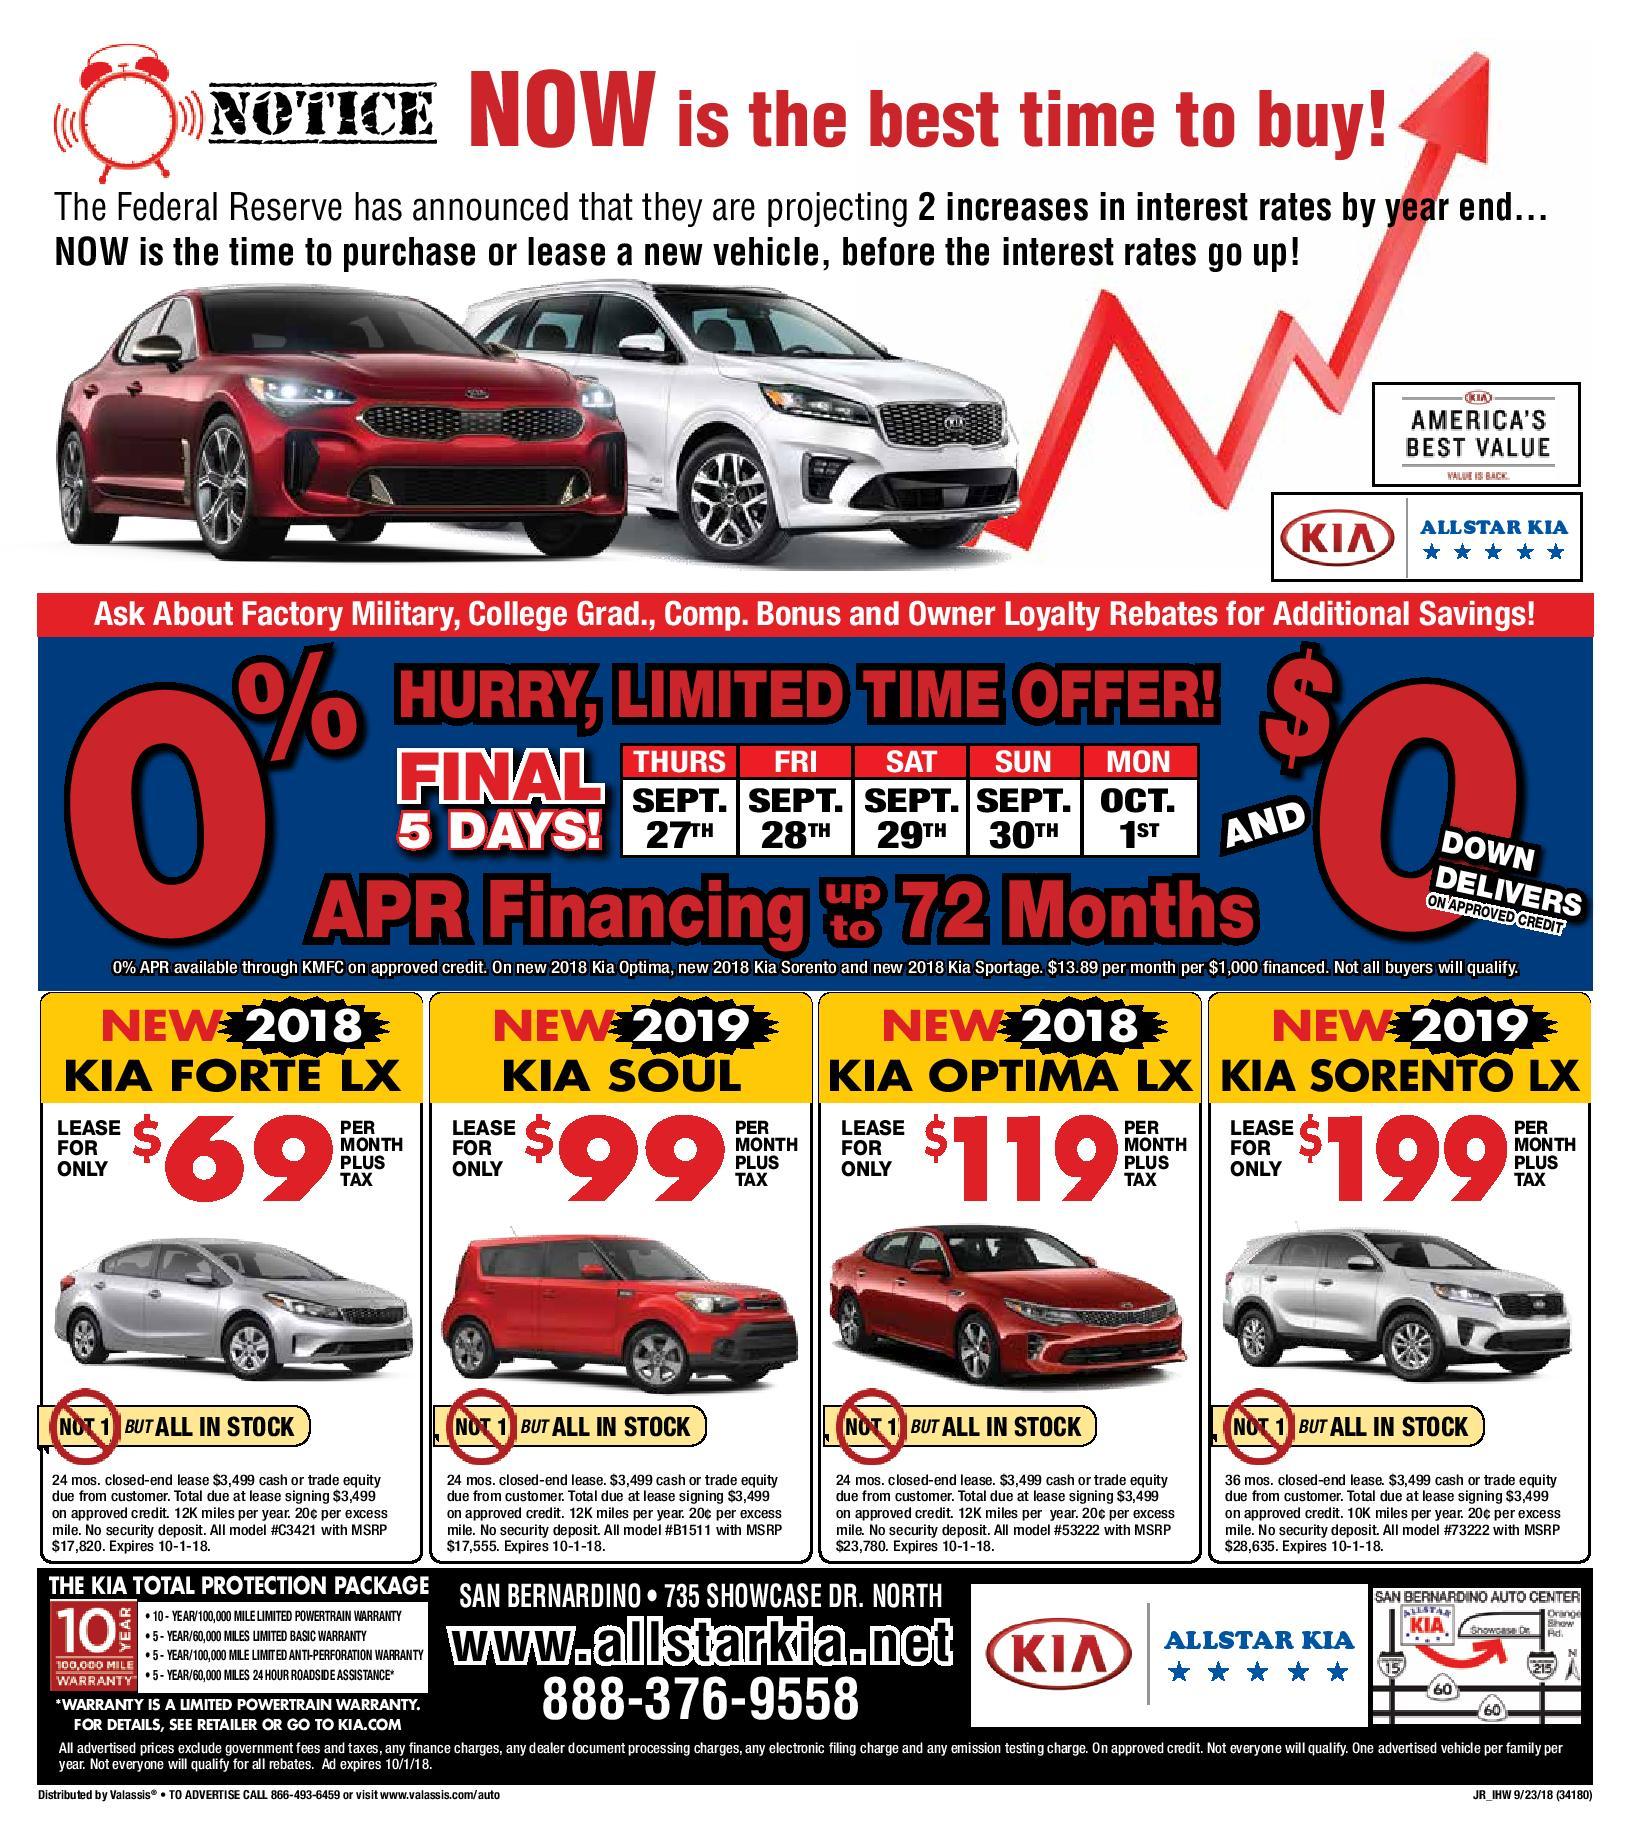 Current Ads Kia Coupons All Star Kia San Bernardino Allstar Jpg 1631x1838  Kia Ads